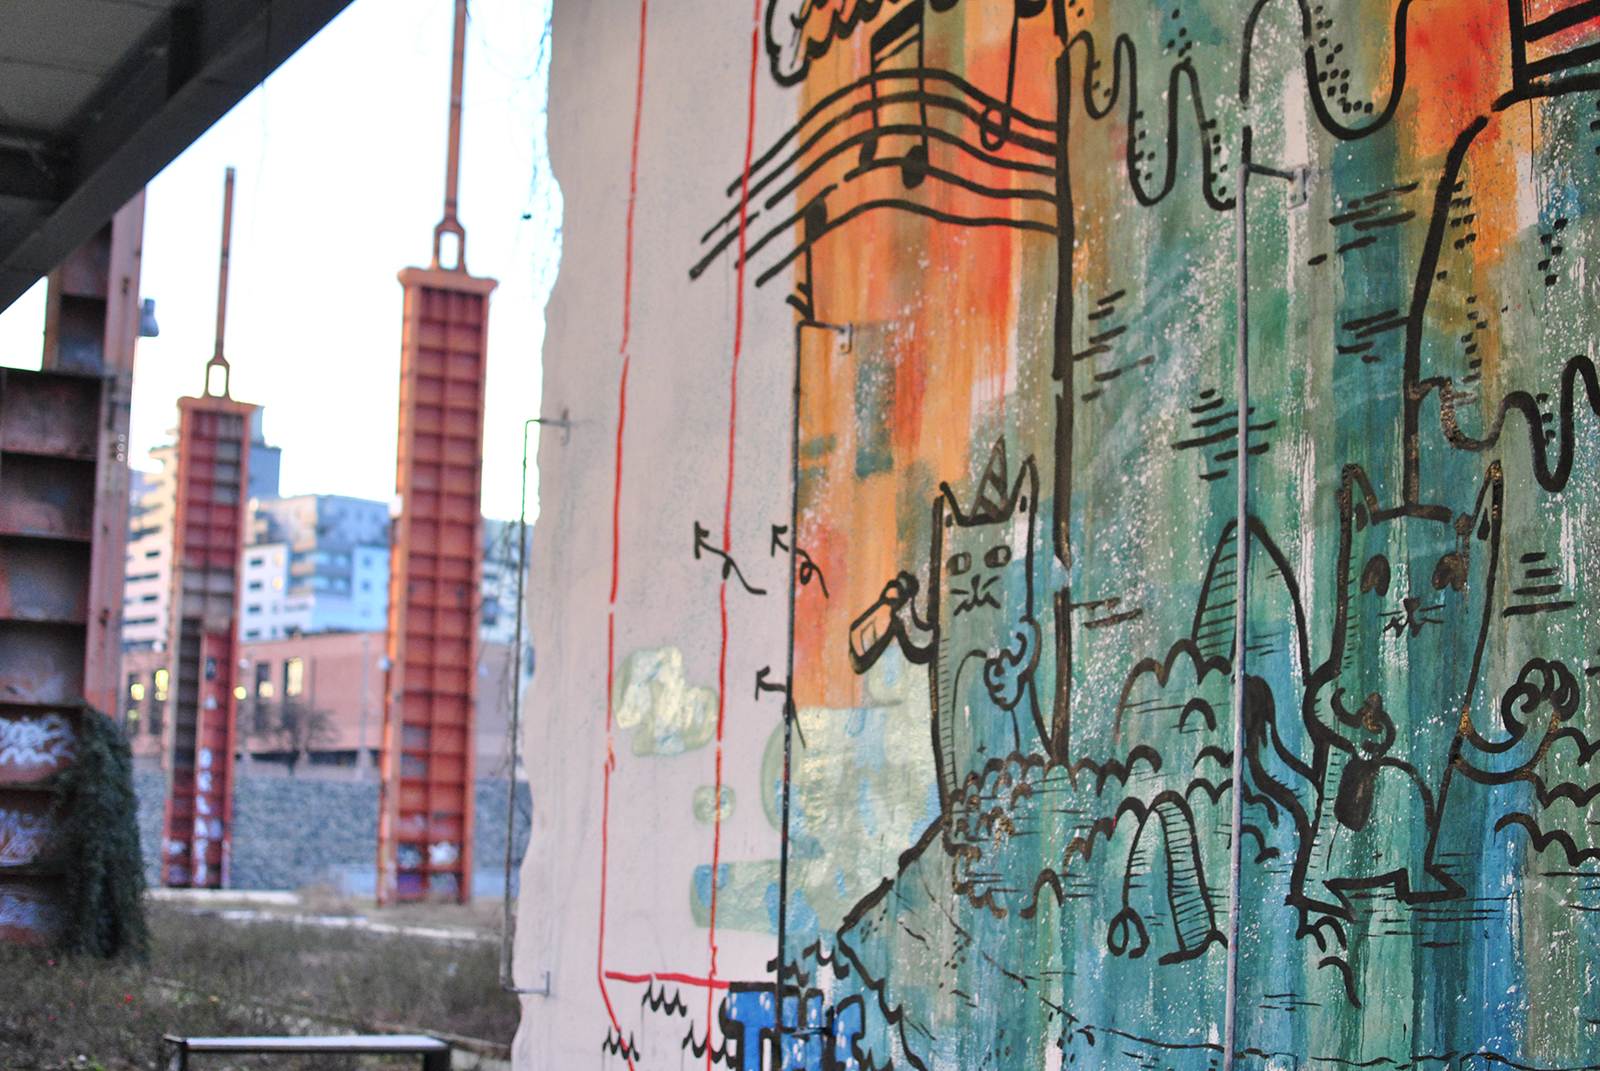 el-euro-new-mural-at-parco-dora-torino-02